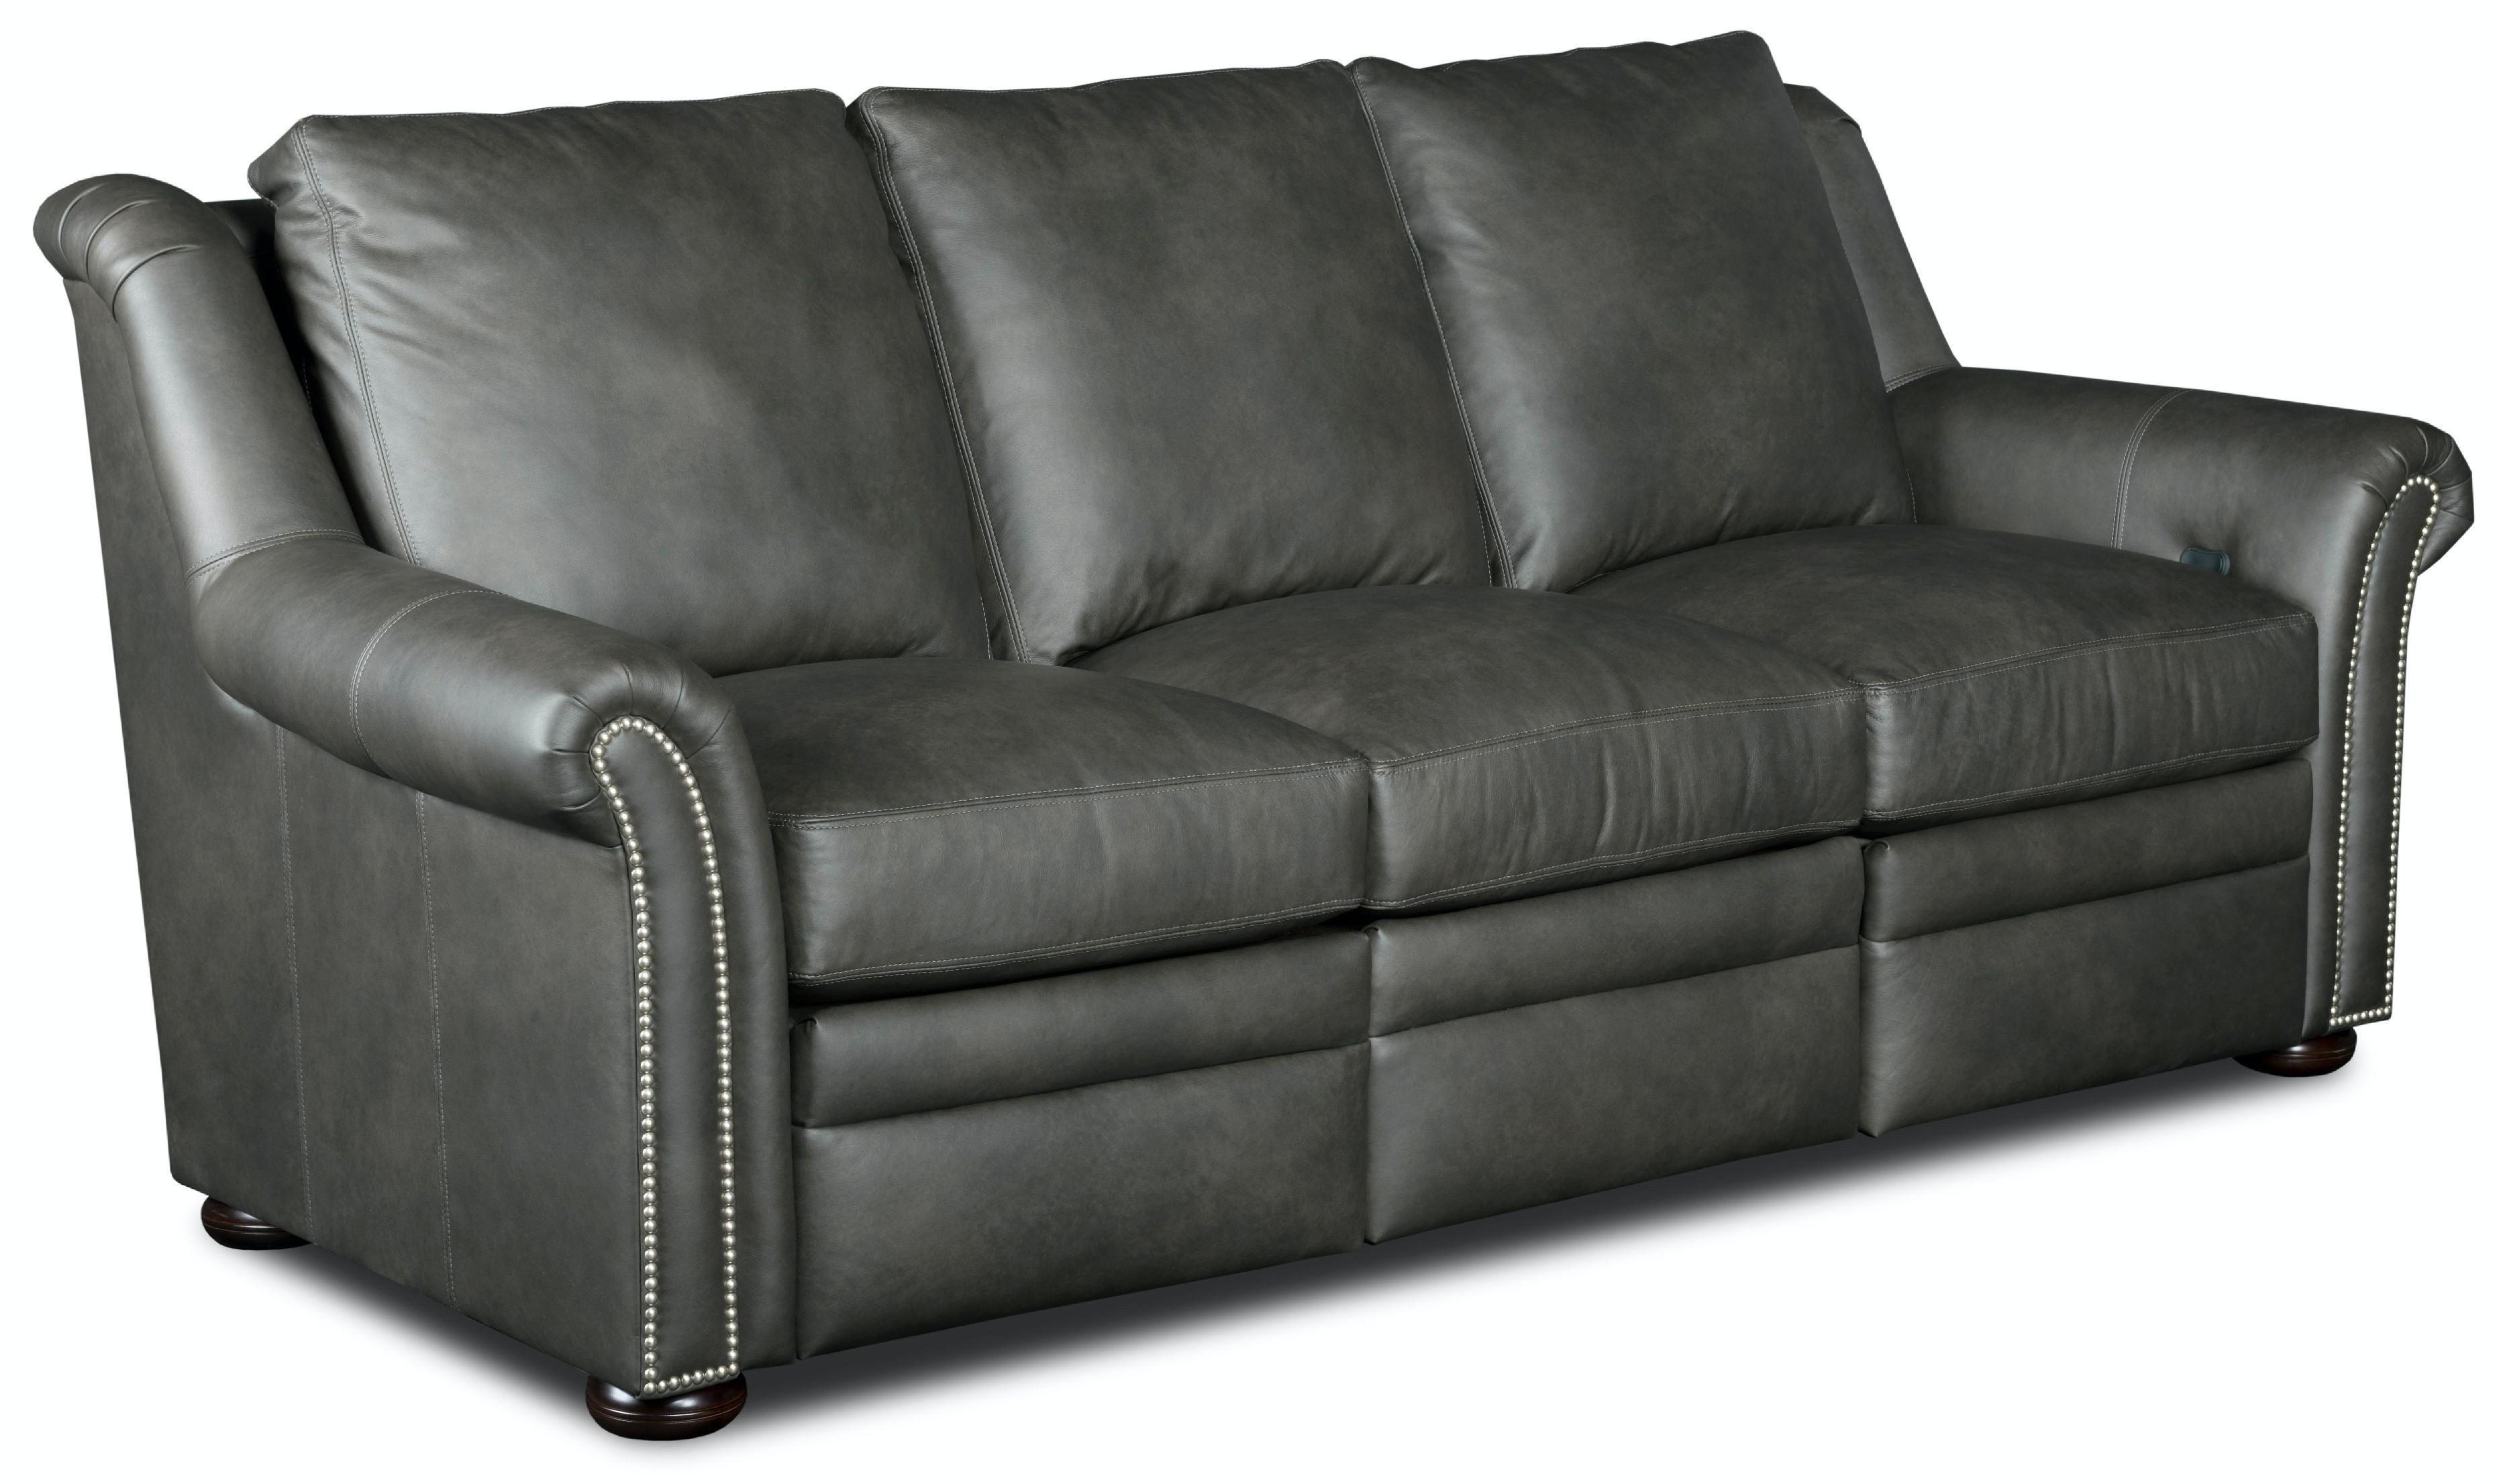 bradington young living room newman sofa full recline at both arms rh bradington young com